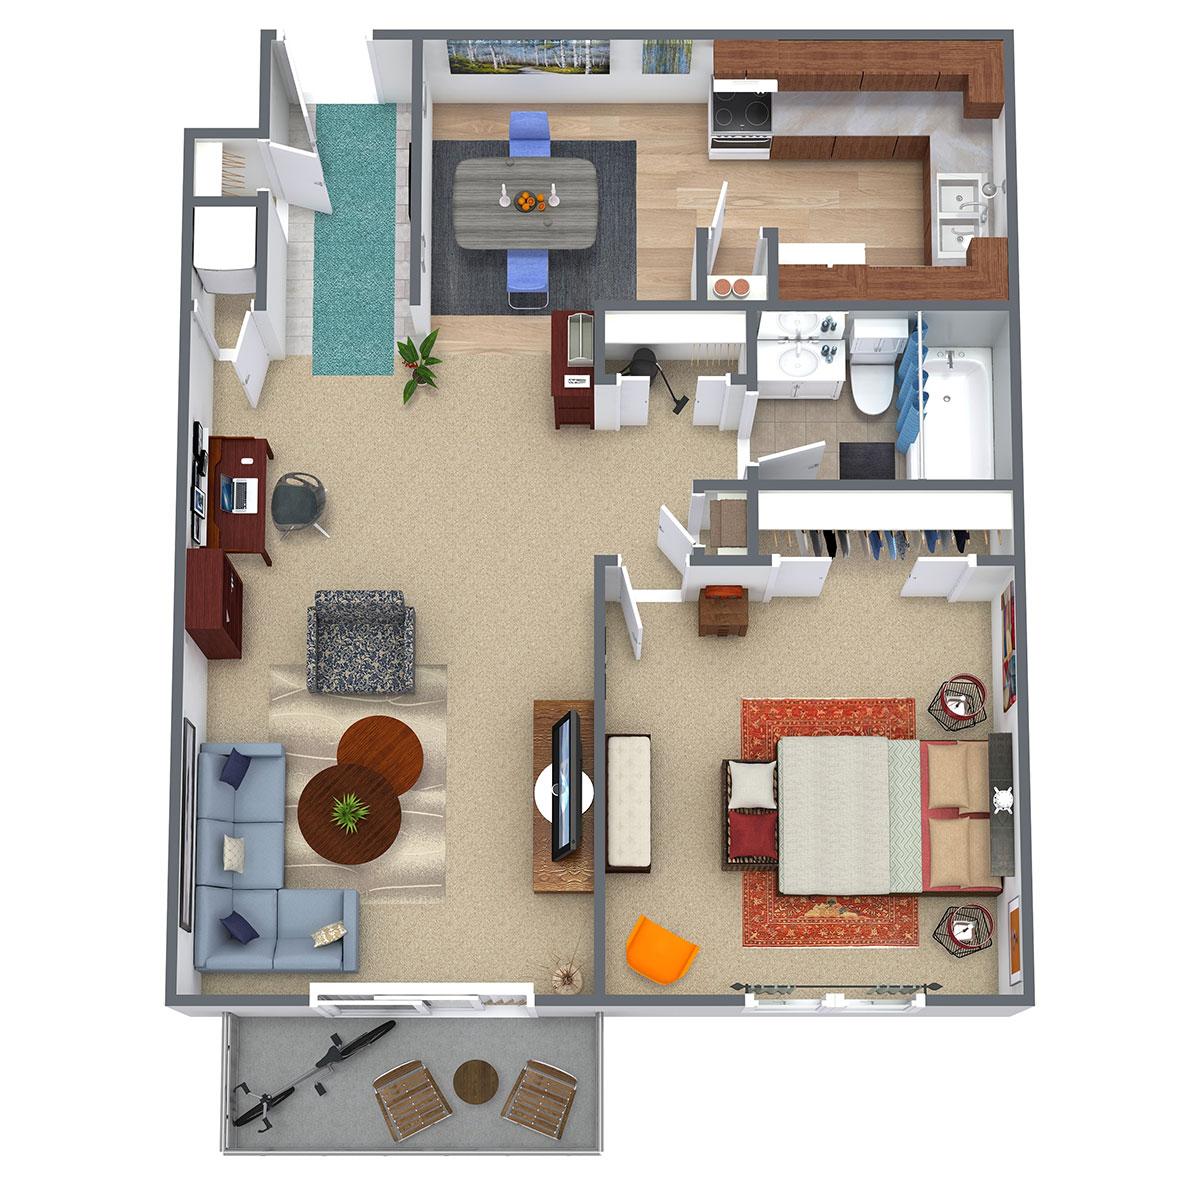 Floorplan - 1 Bed/1Bath - Updated image